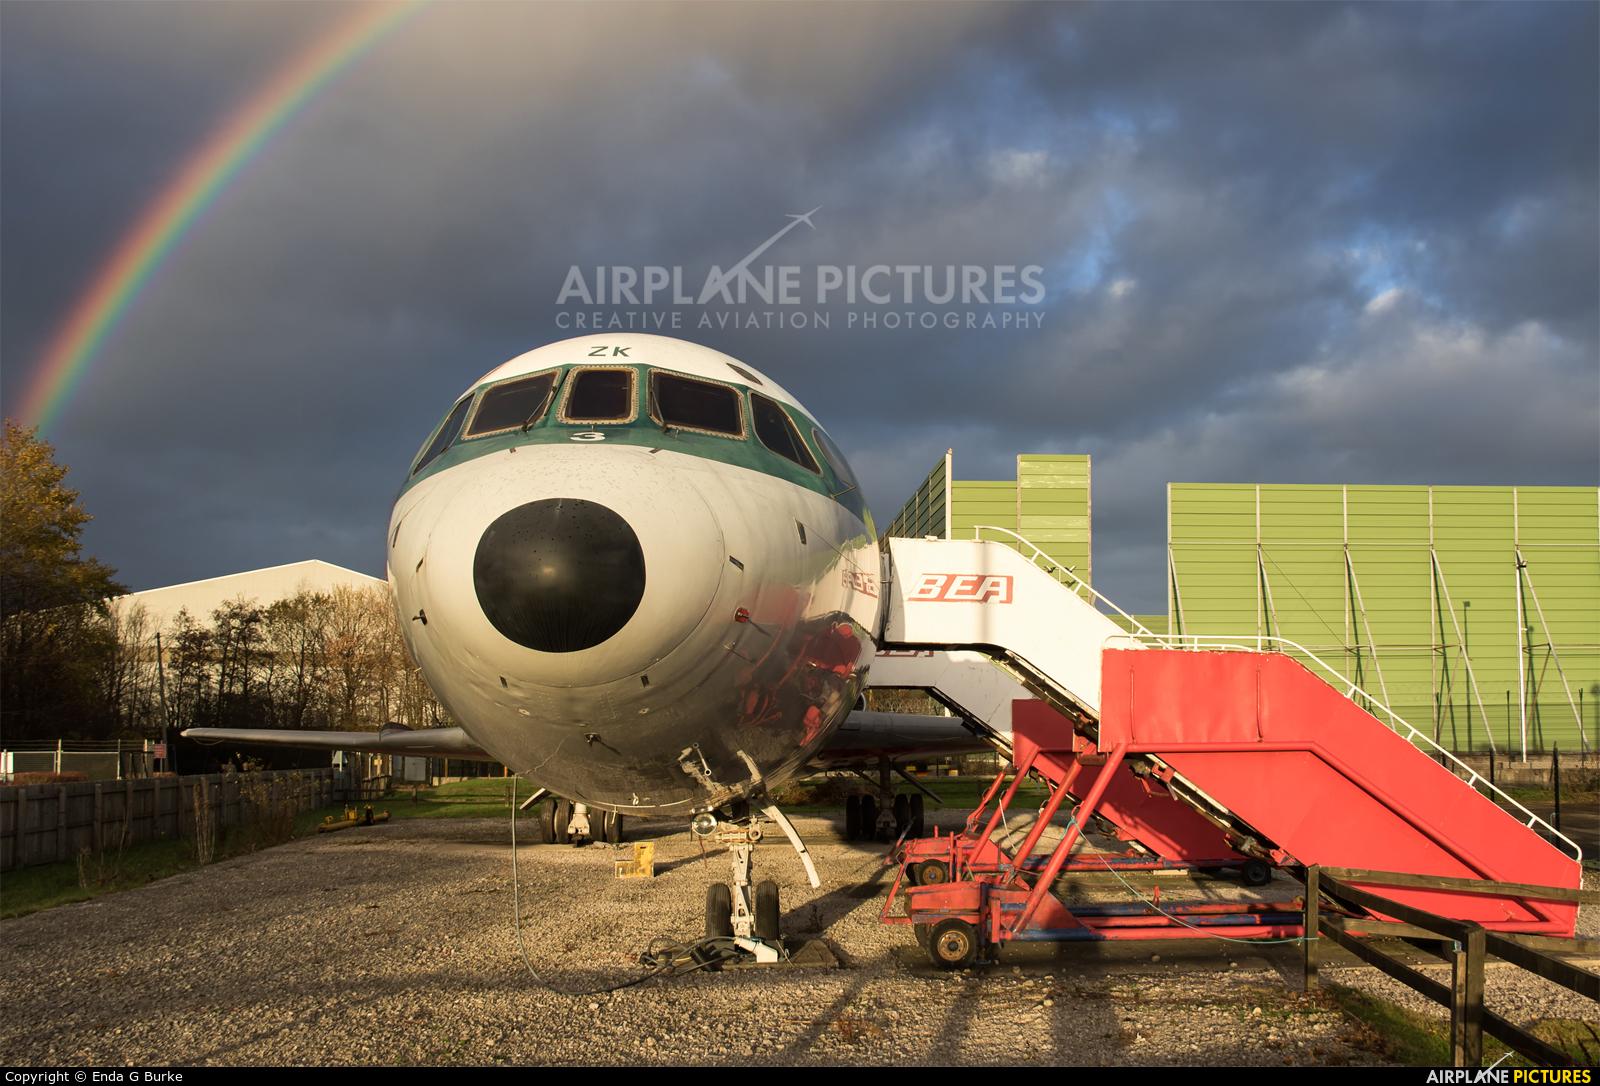 BEA - British European Airways G-AWZK aircraft at Manchester